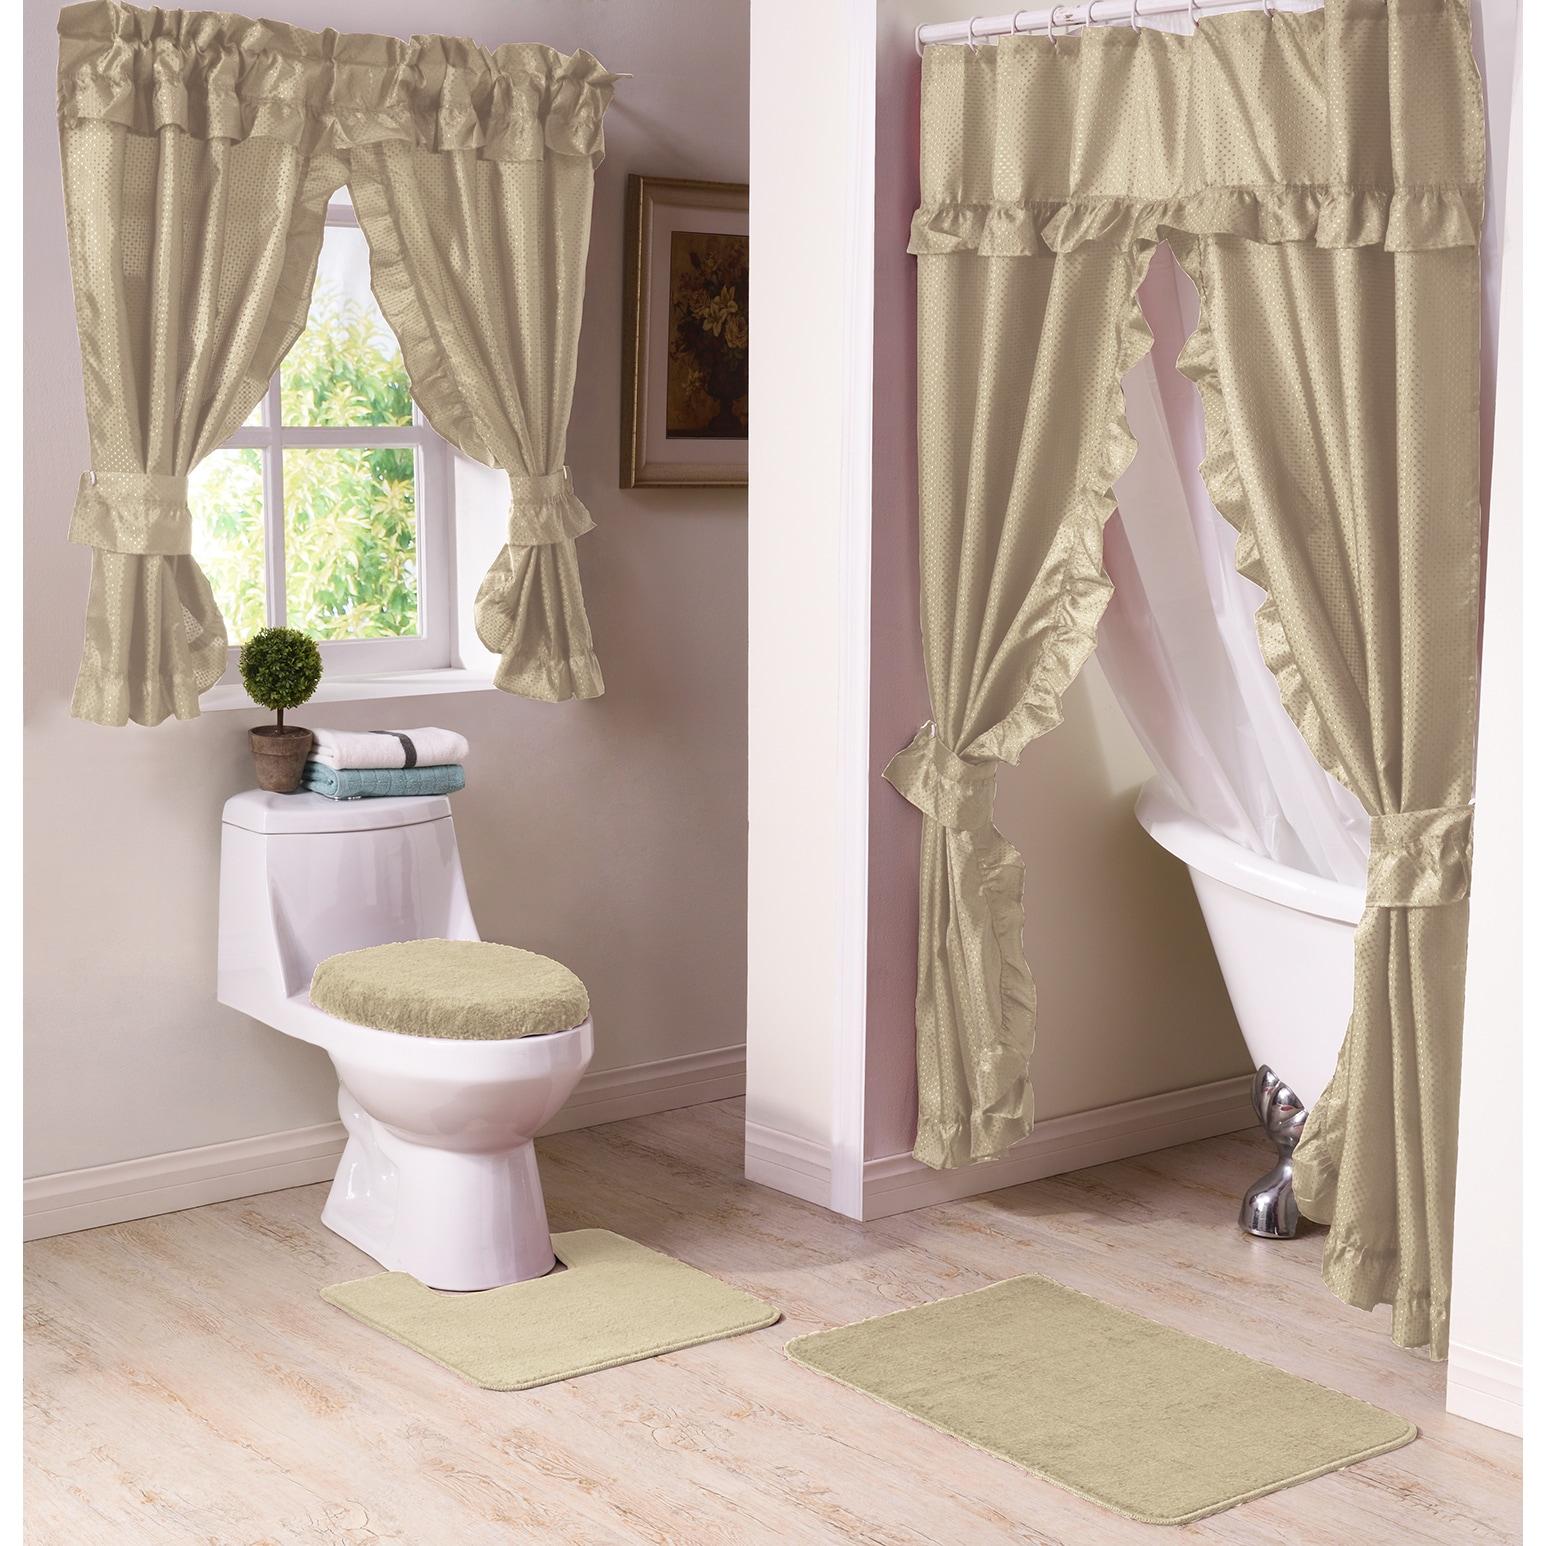 Shop Starlite 11-Piece Shower Curtain and Window Curtain Bath Set ...